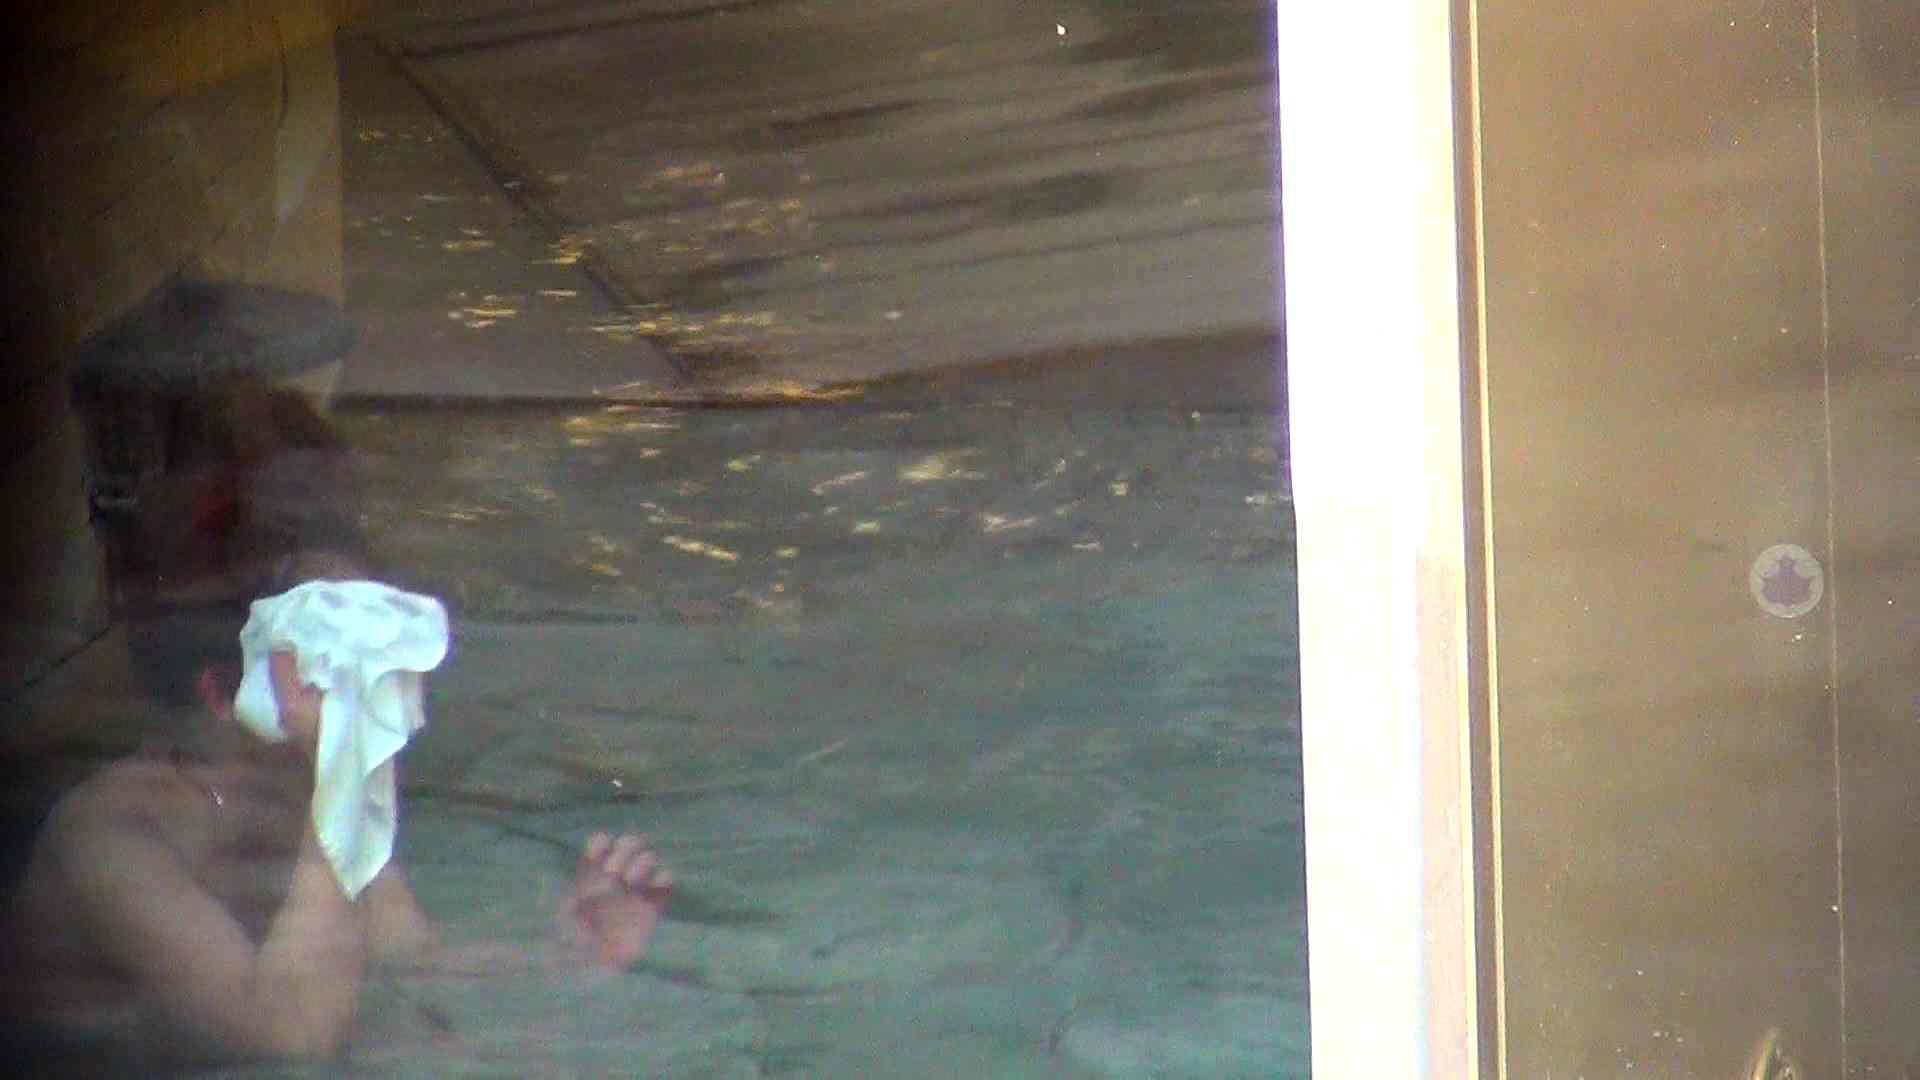 Aquaな露天風呂Vol.291 盗撮 隠し撮りオマンコ動画紹介 96PICs 77